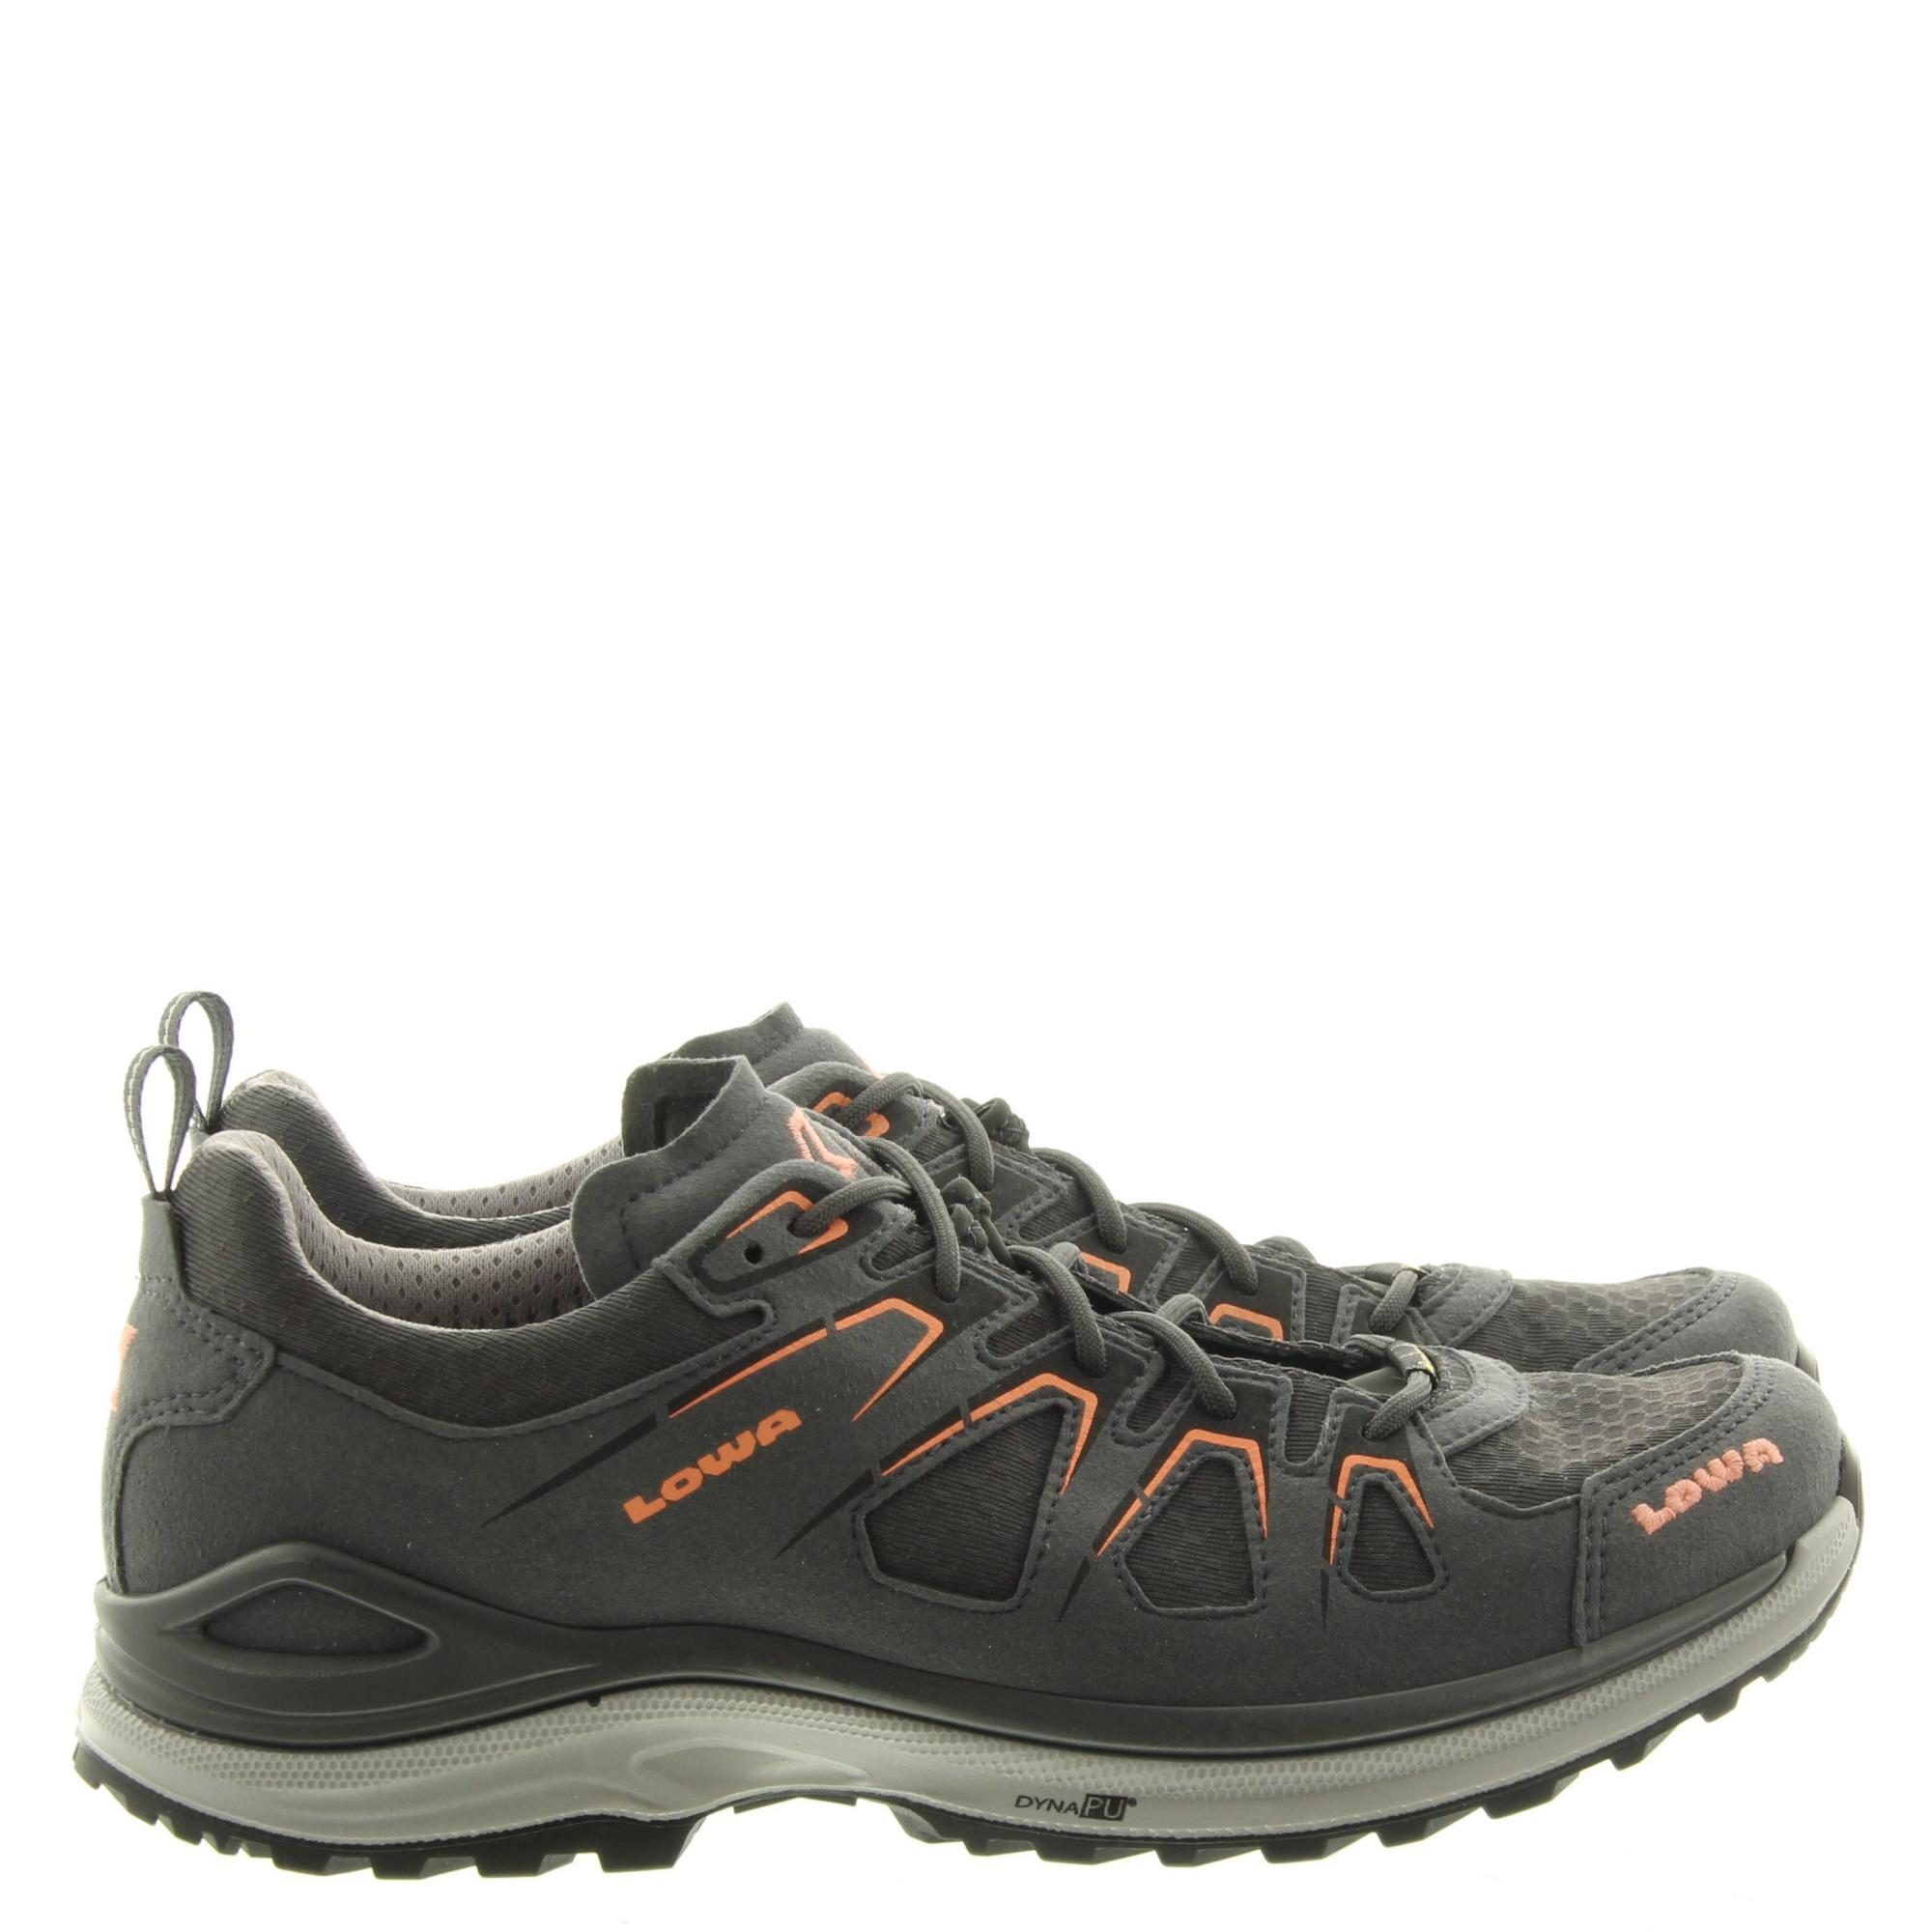 Lowa Innox Evo GTX 320616 9322 Asphalt Lachs